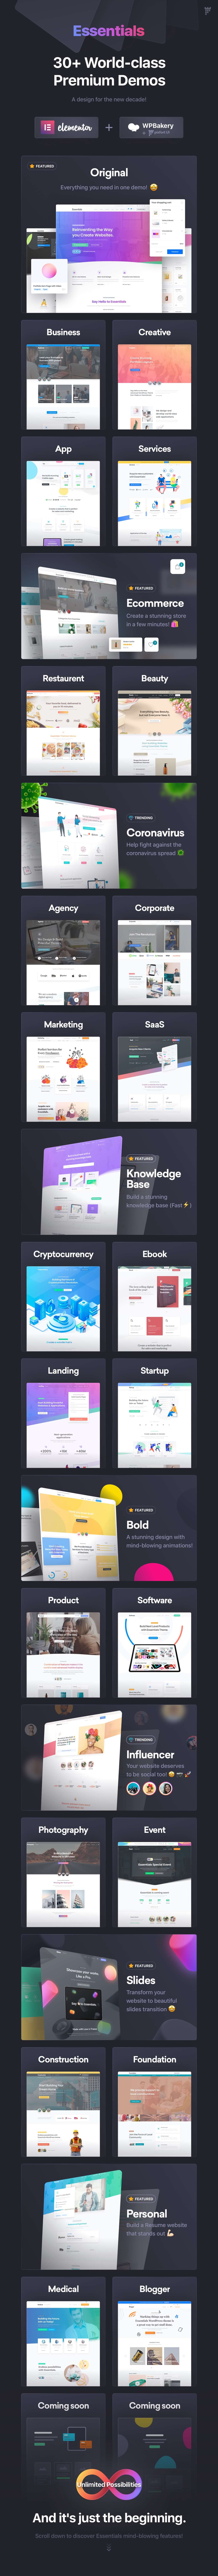 Essentials | Multipurpose WordPress Theme - 14